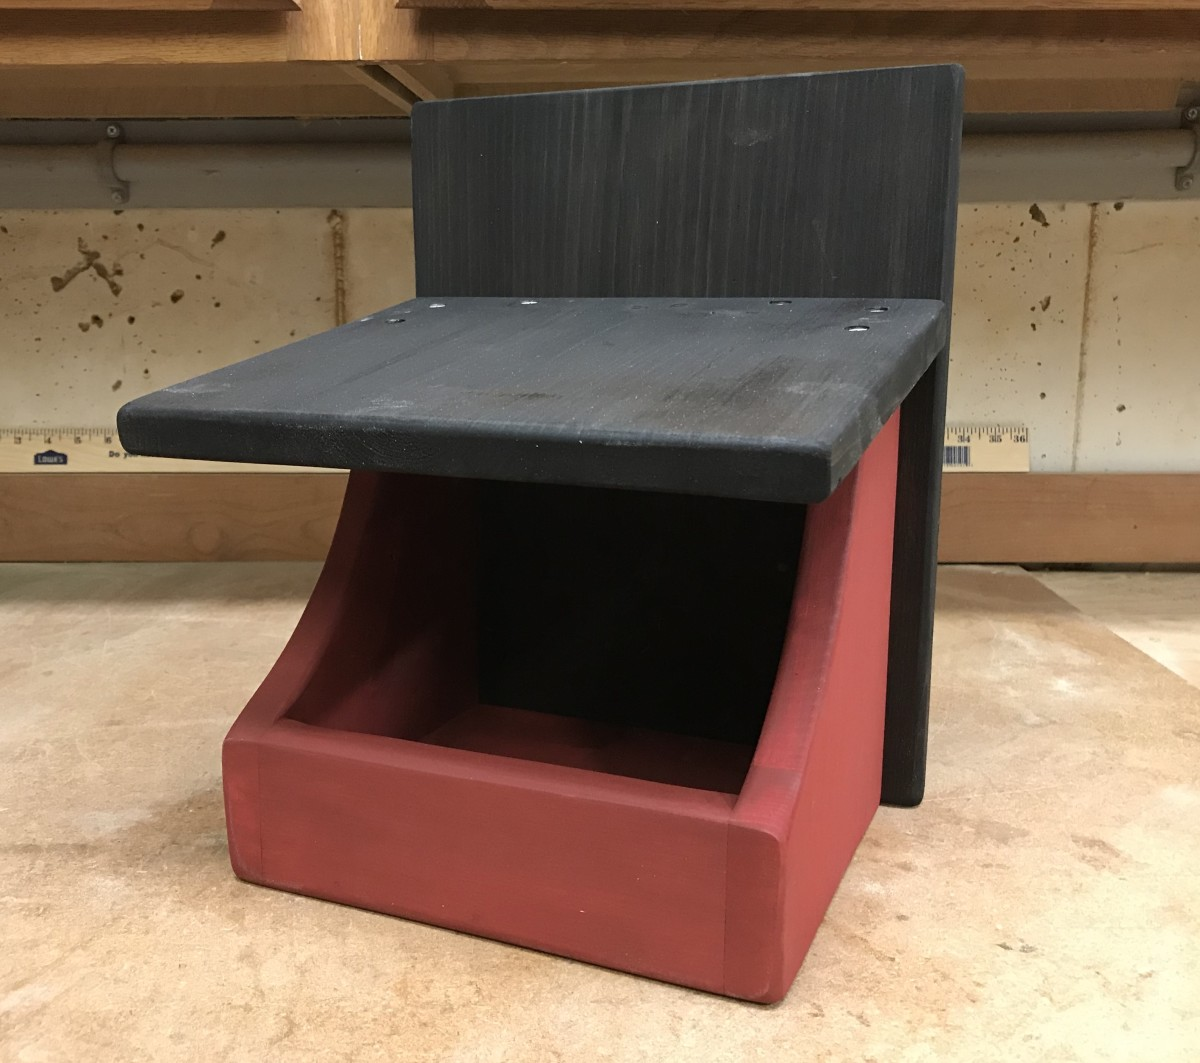 Build this Robin Nesting Shelf